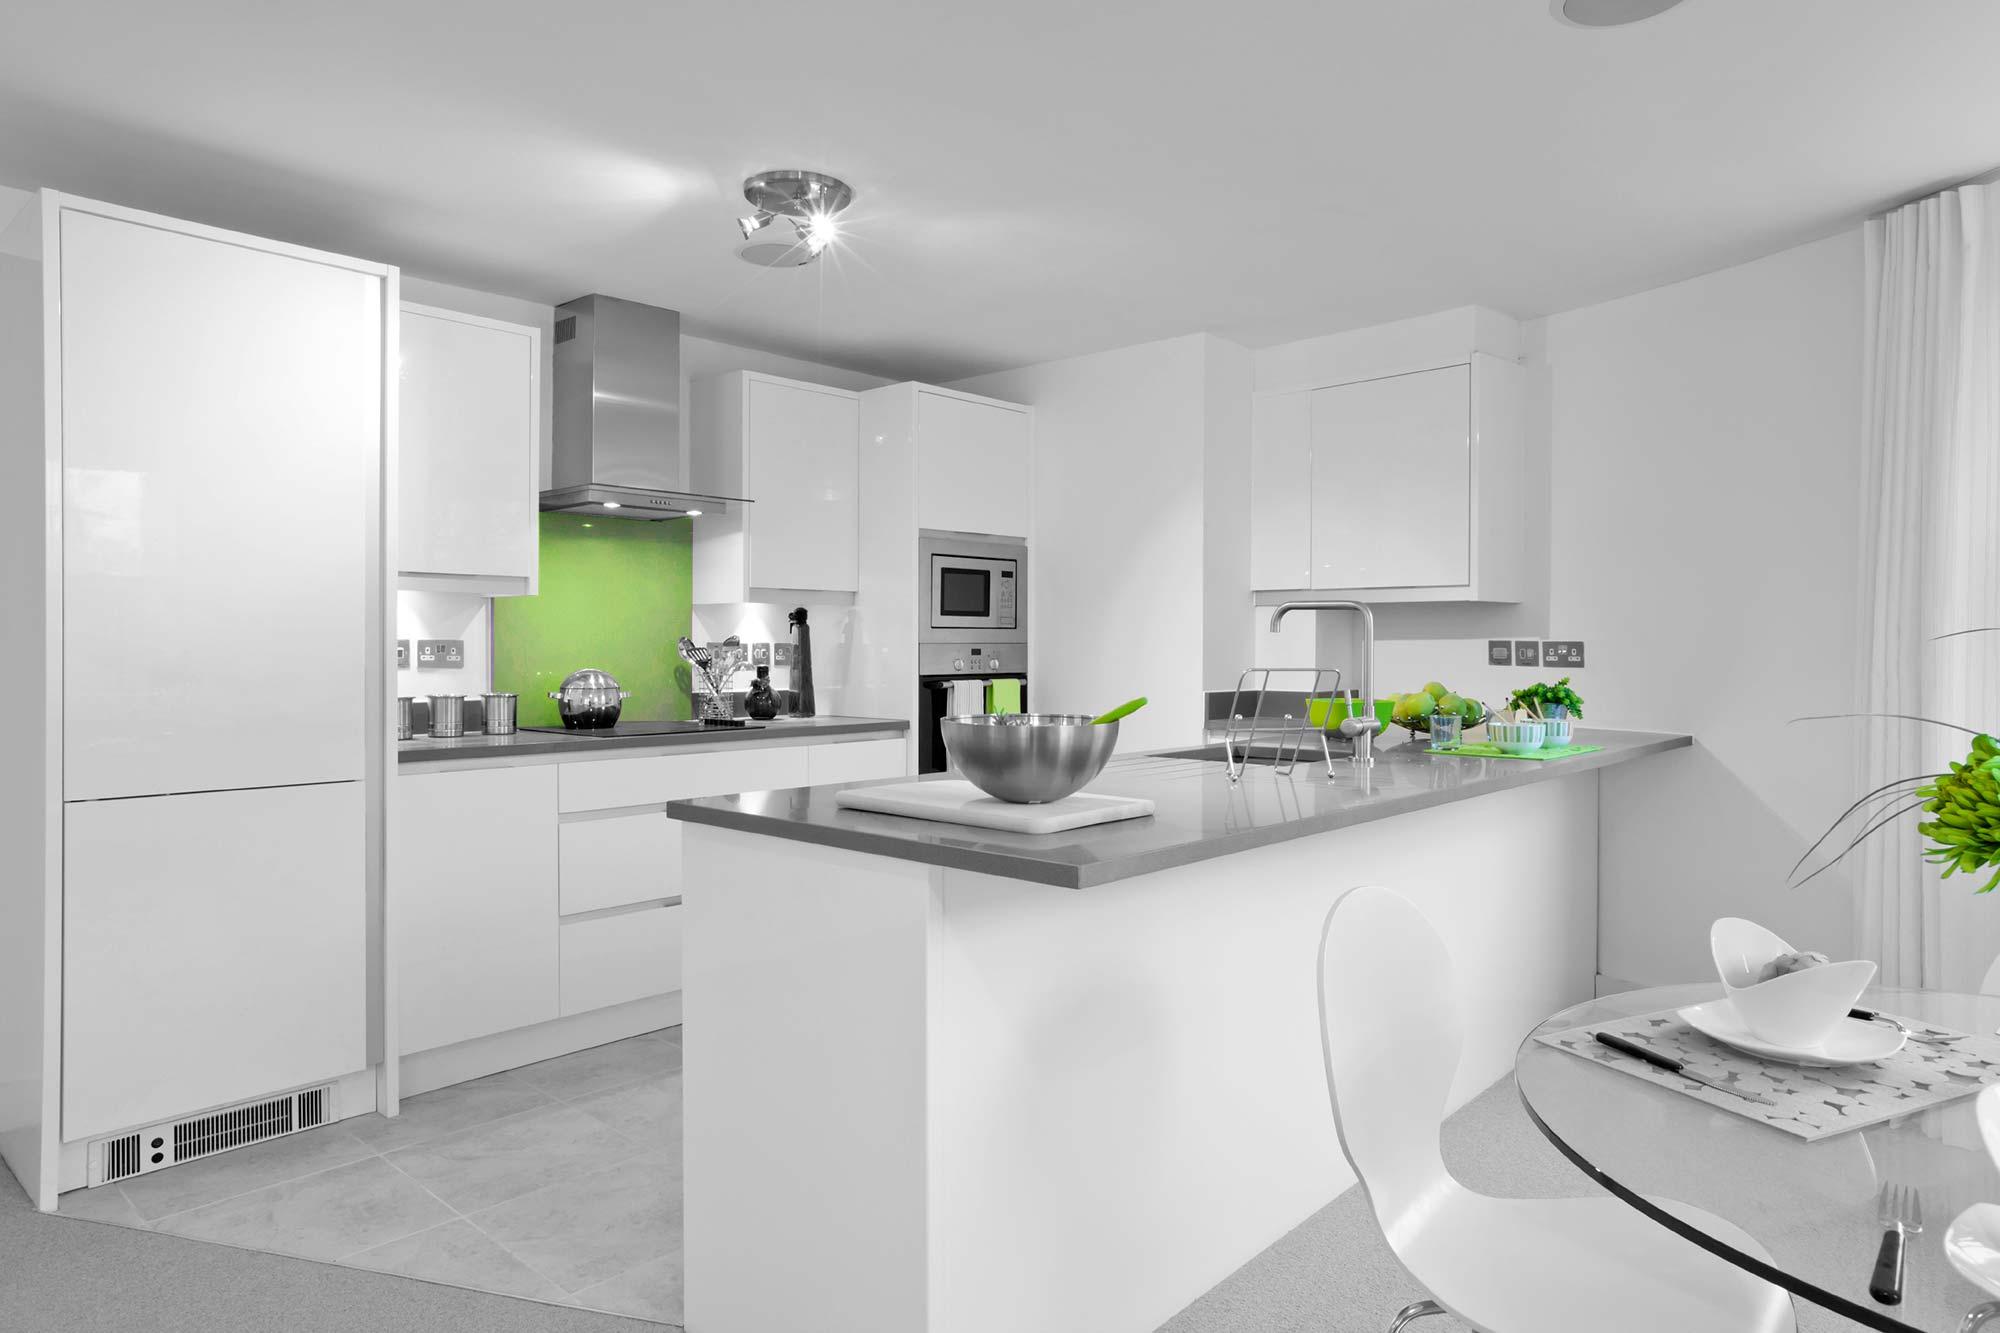 Kitchens | Wayne Smith Renovations